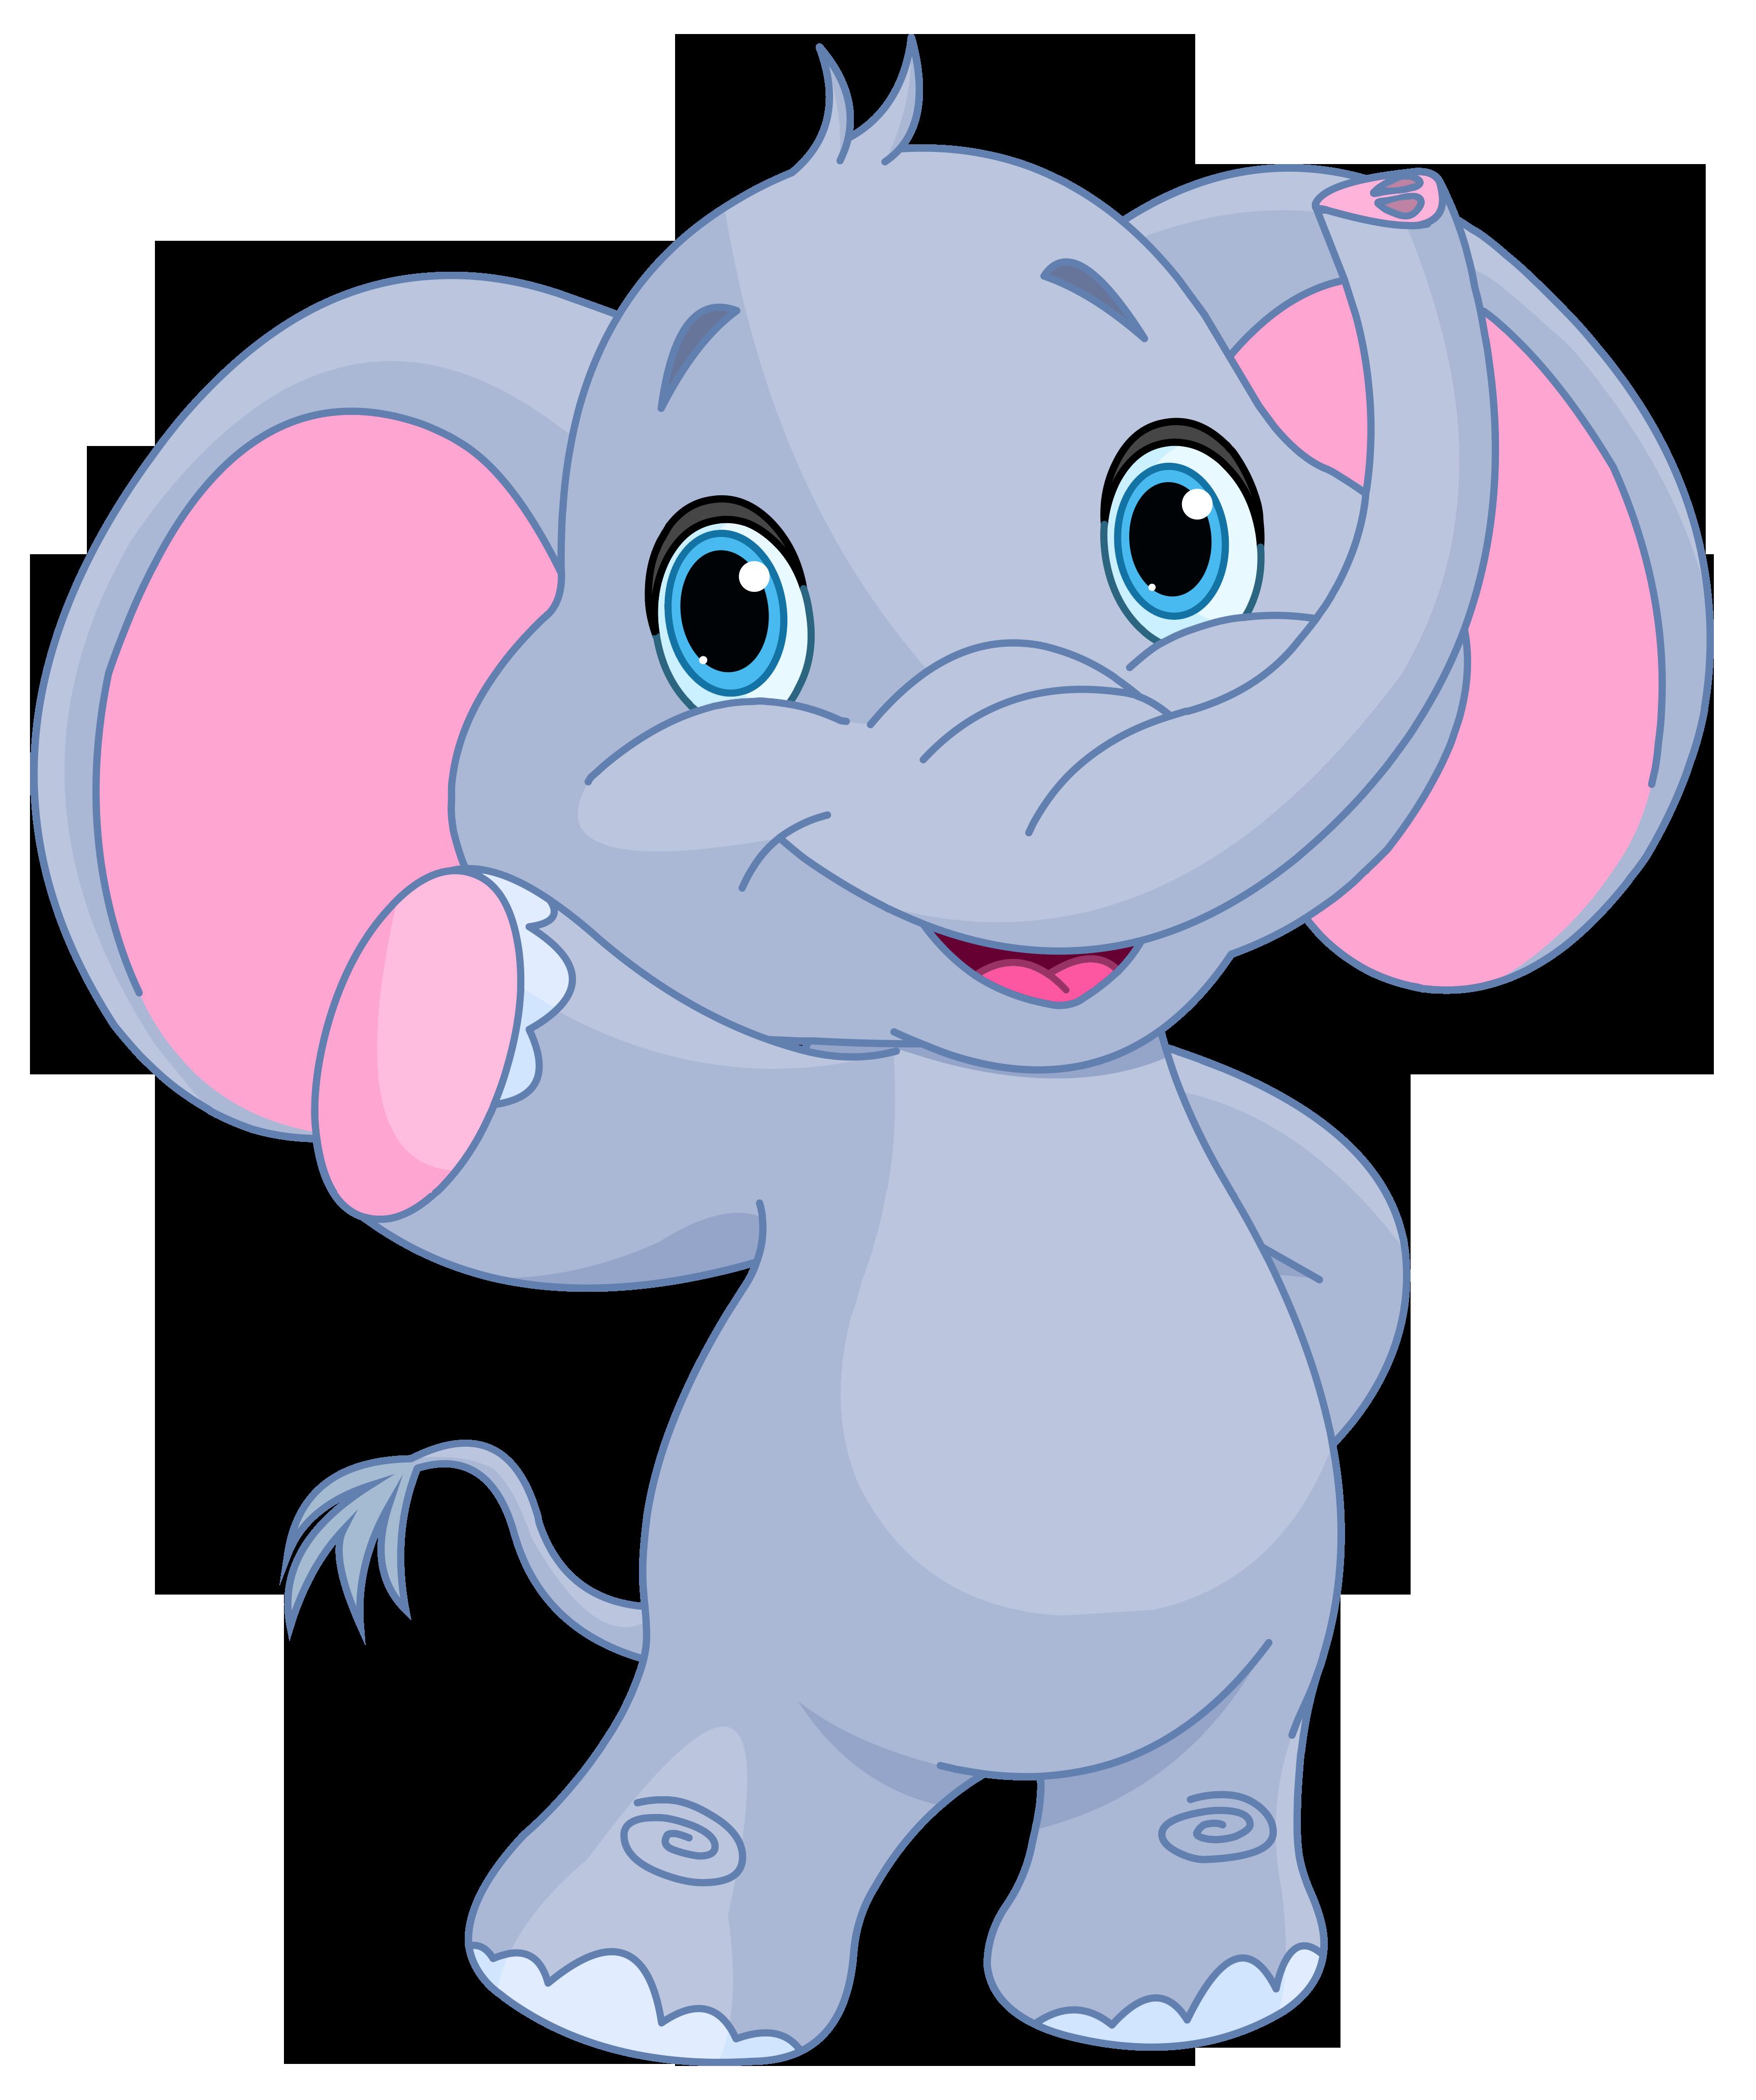 Cute elephant clipart image.